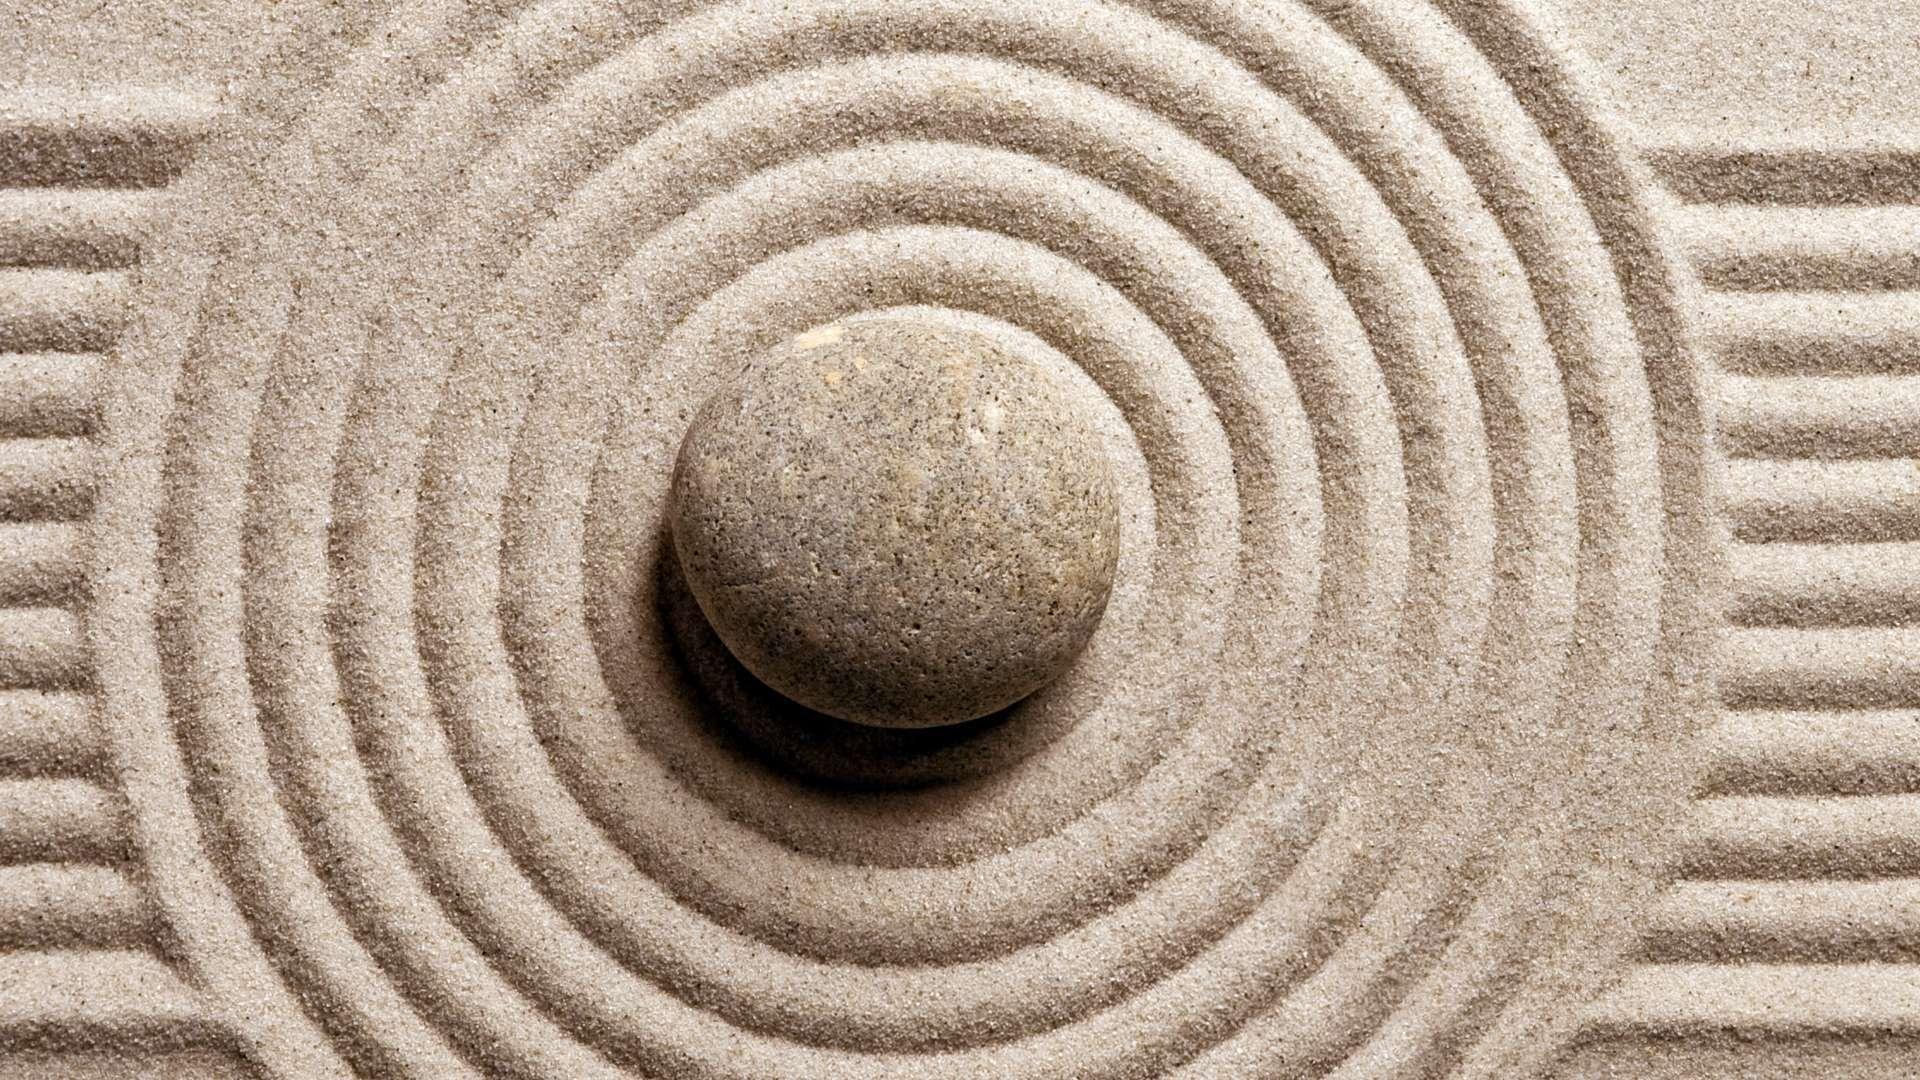 Hd wallpaper zen - Wallpaper Stone Sand Harmony Zen Hd Wallpaper 1080p Upload At July 7